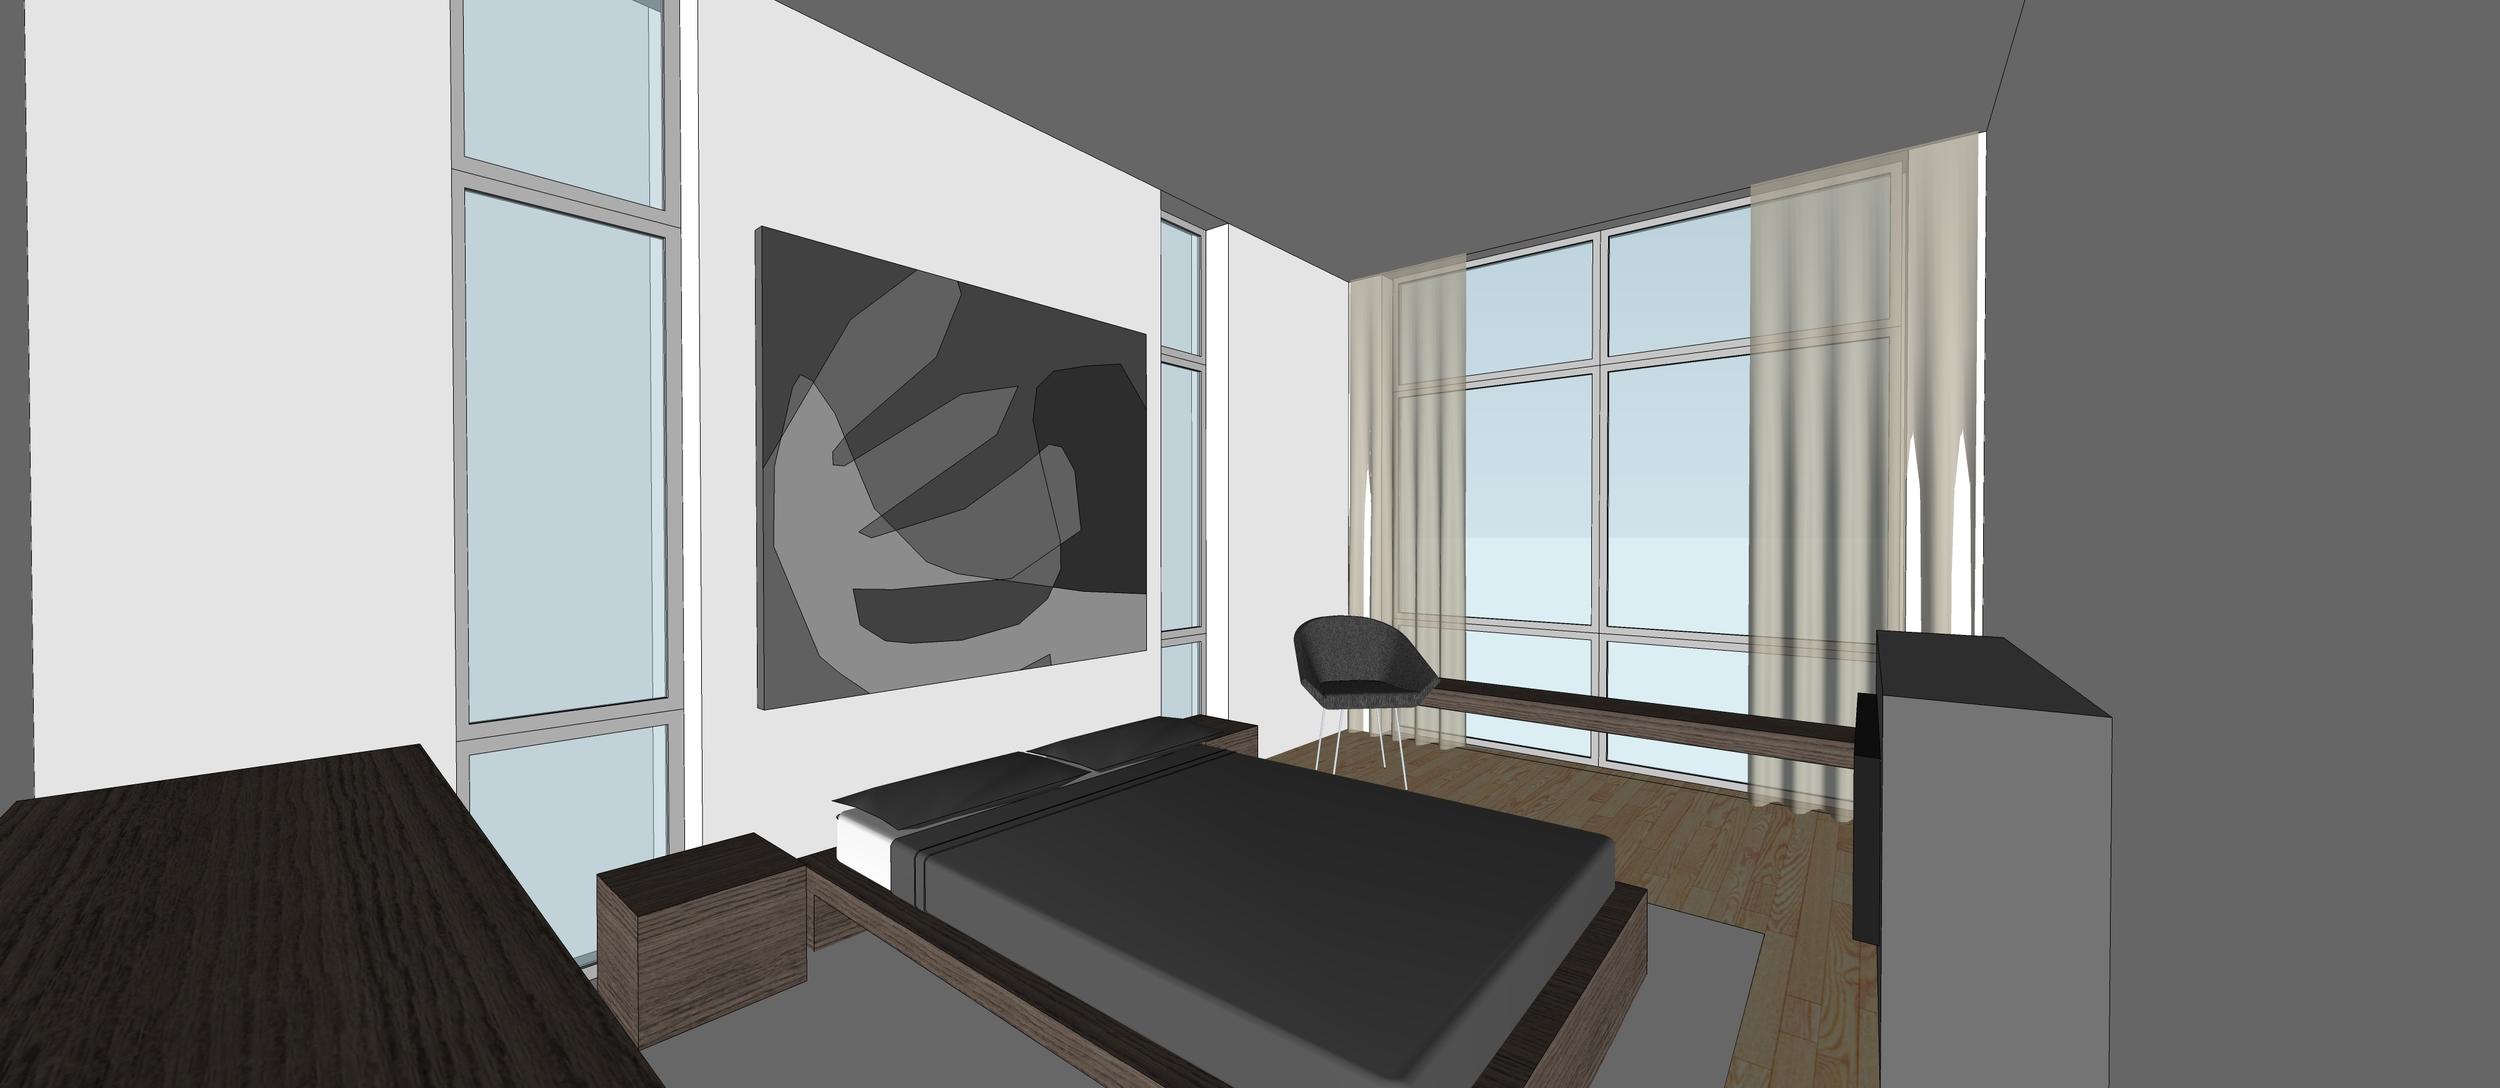 2 Point Perspective - Andersonville Residence (Bedroom).jpg